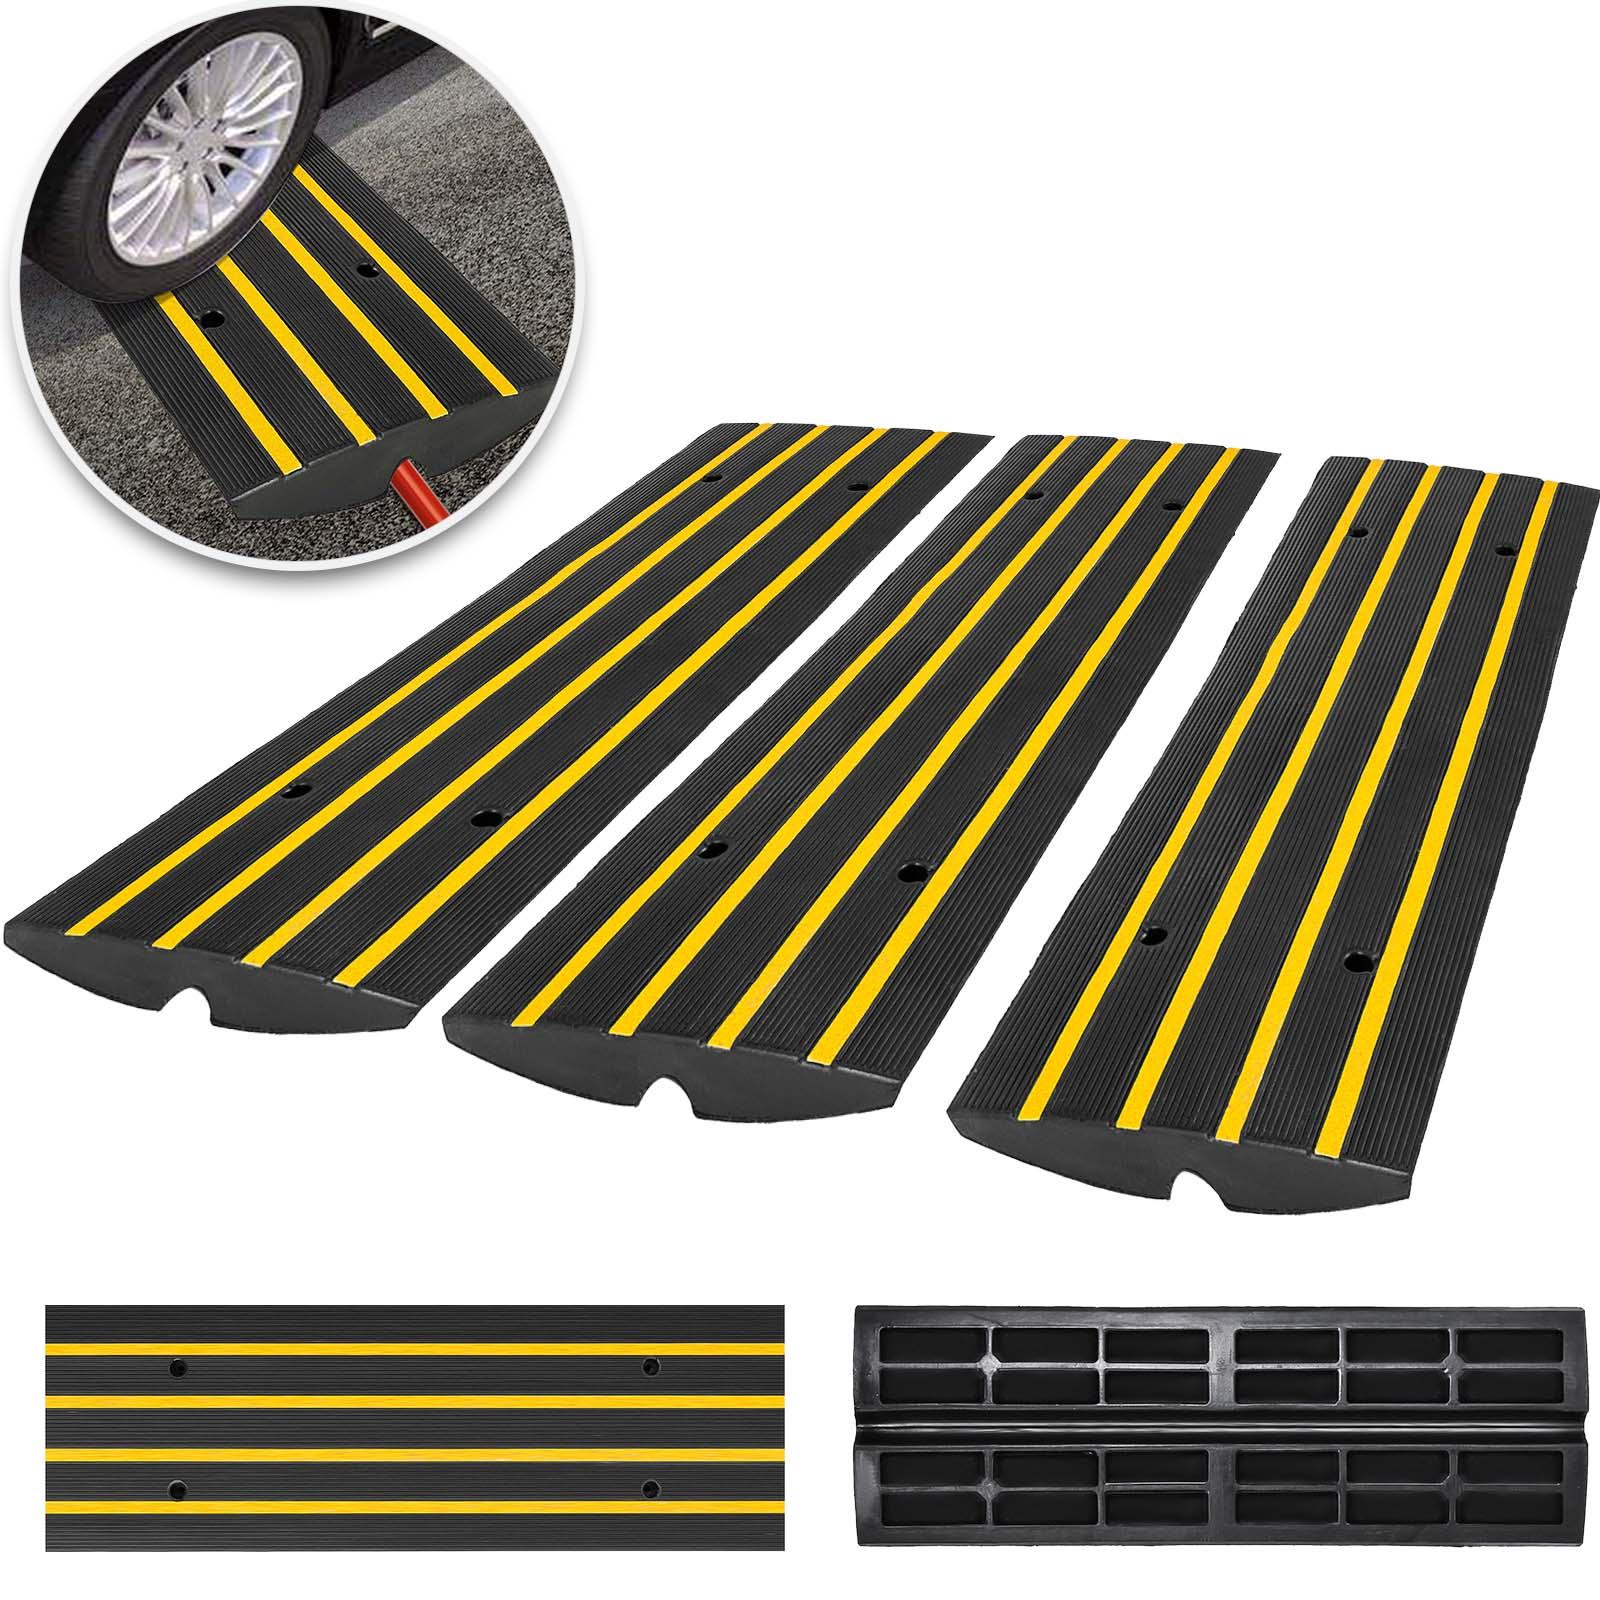 3pcs Curb Ramp Rubber Car Driveway Threshold Ramp Parking Lo